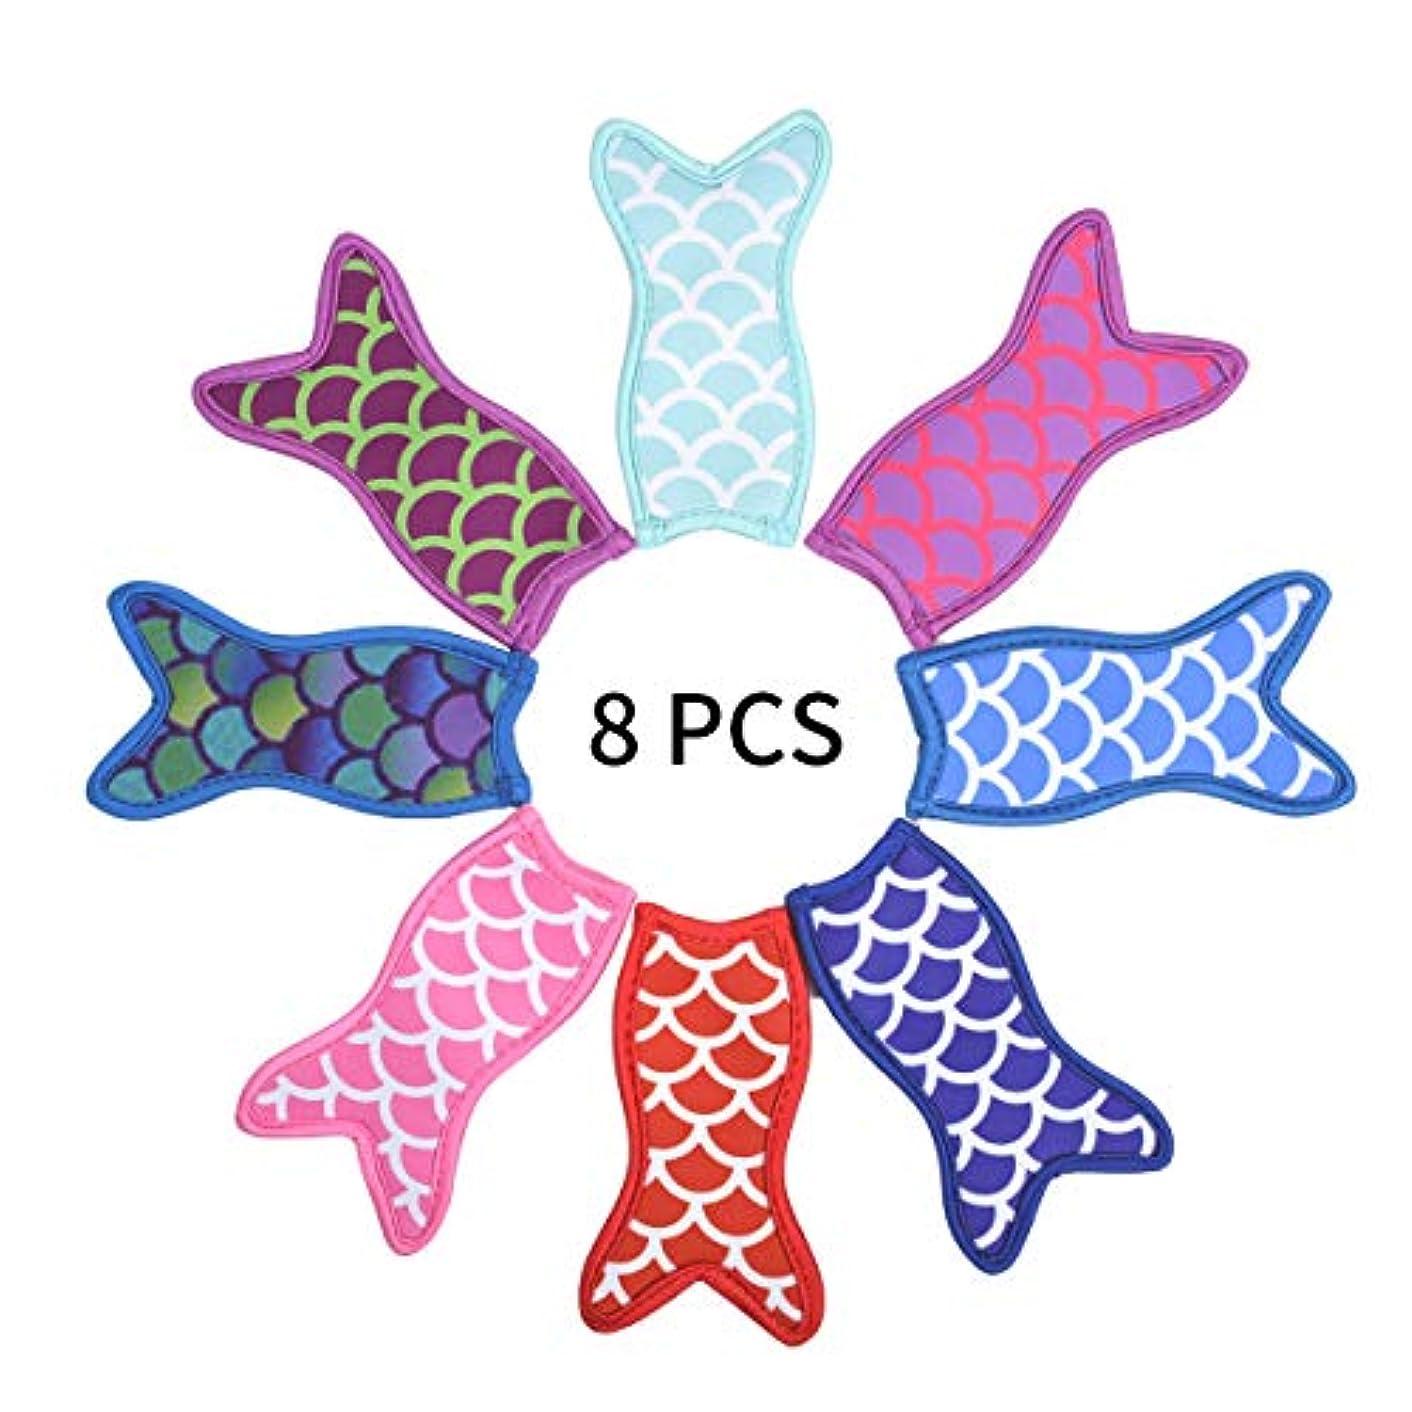 iKammo Mermaid Popsicle Holder,Neoprene Reusable Washable tail Freezer Ice Pop Sleeves (Mermaid)